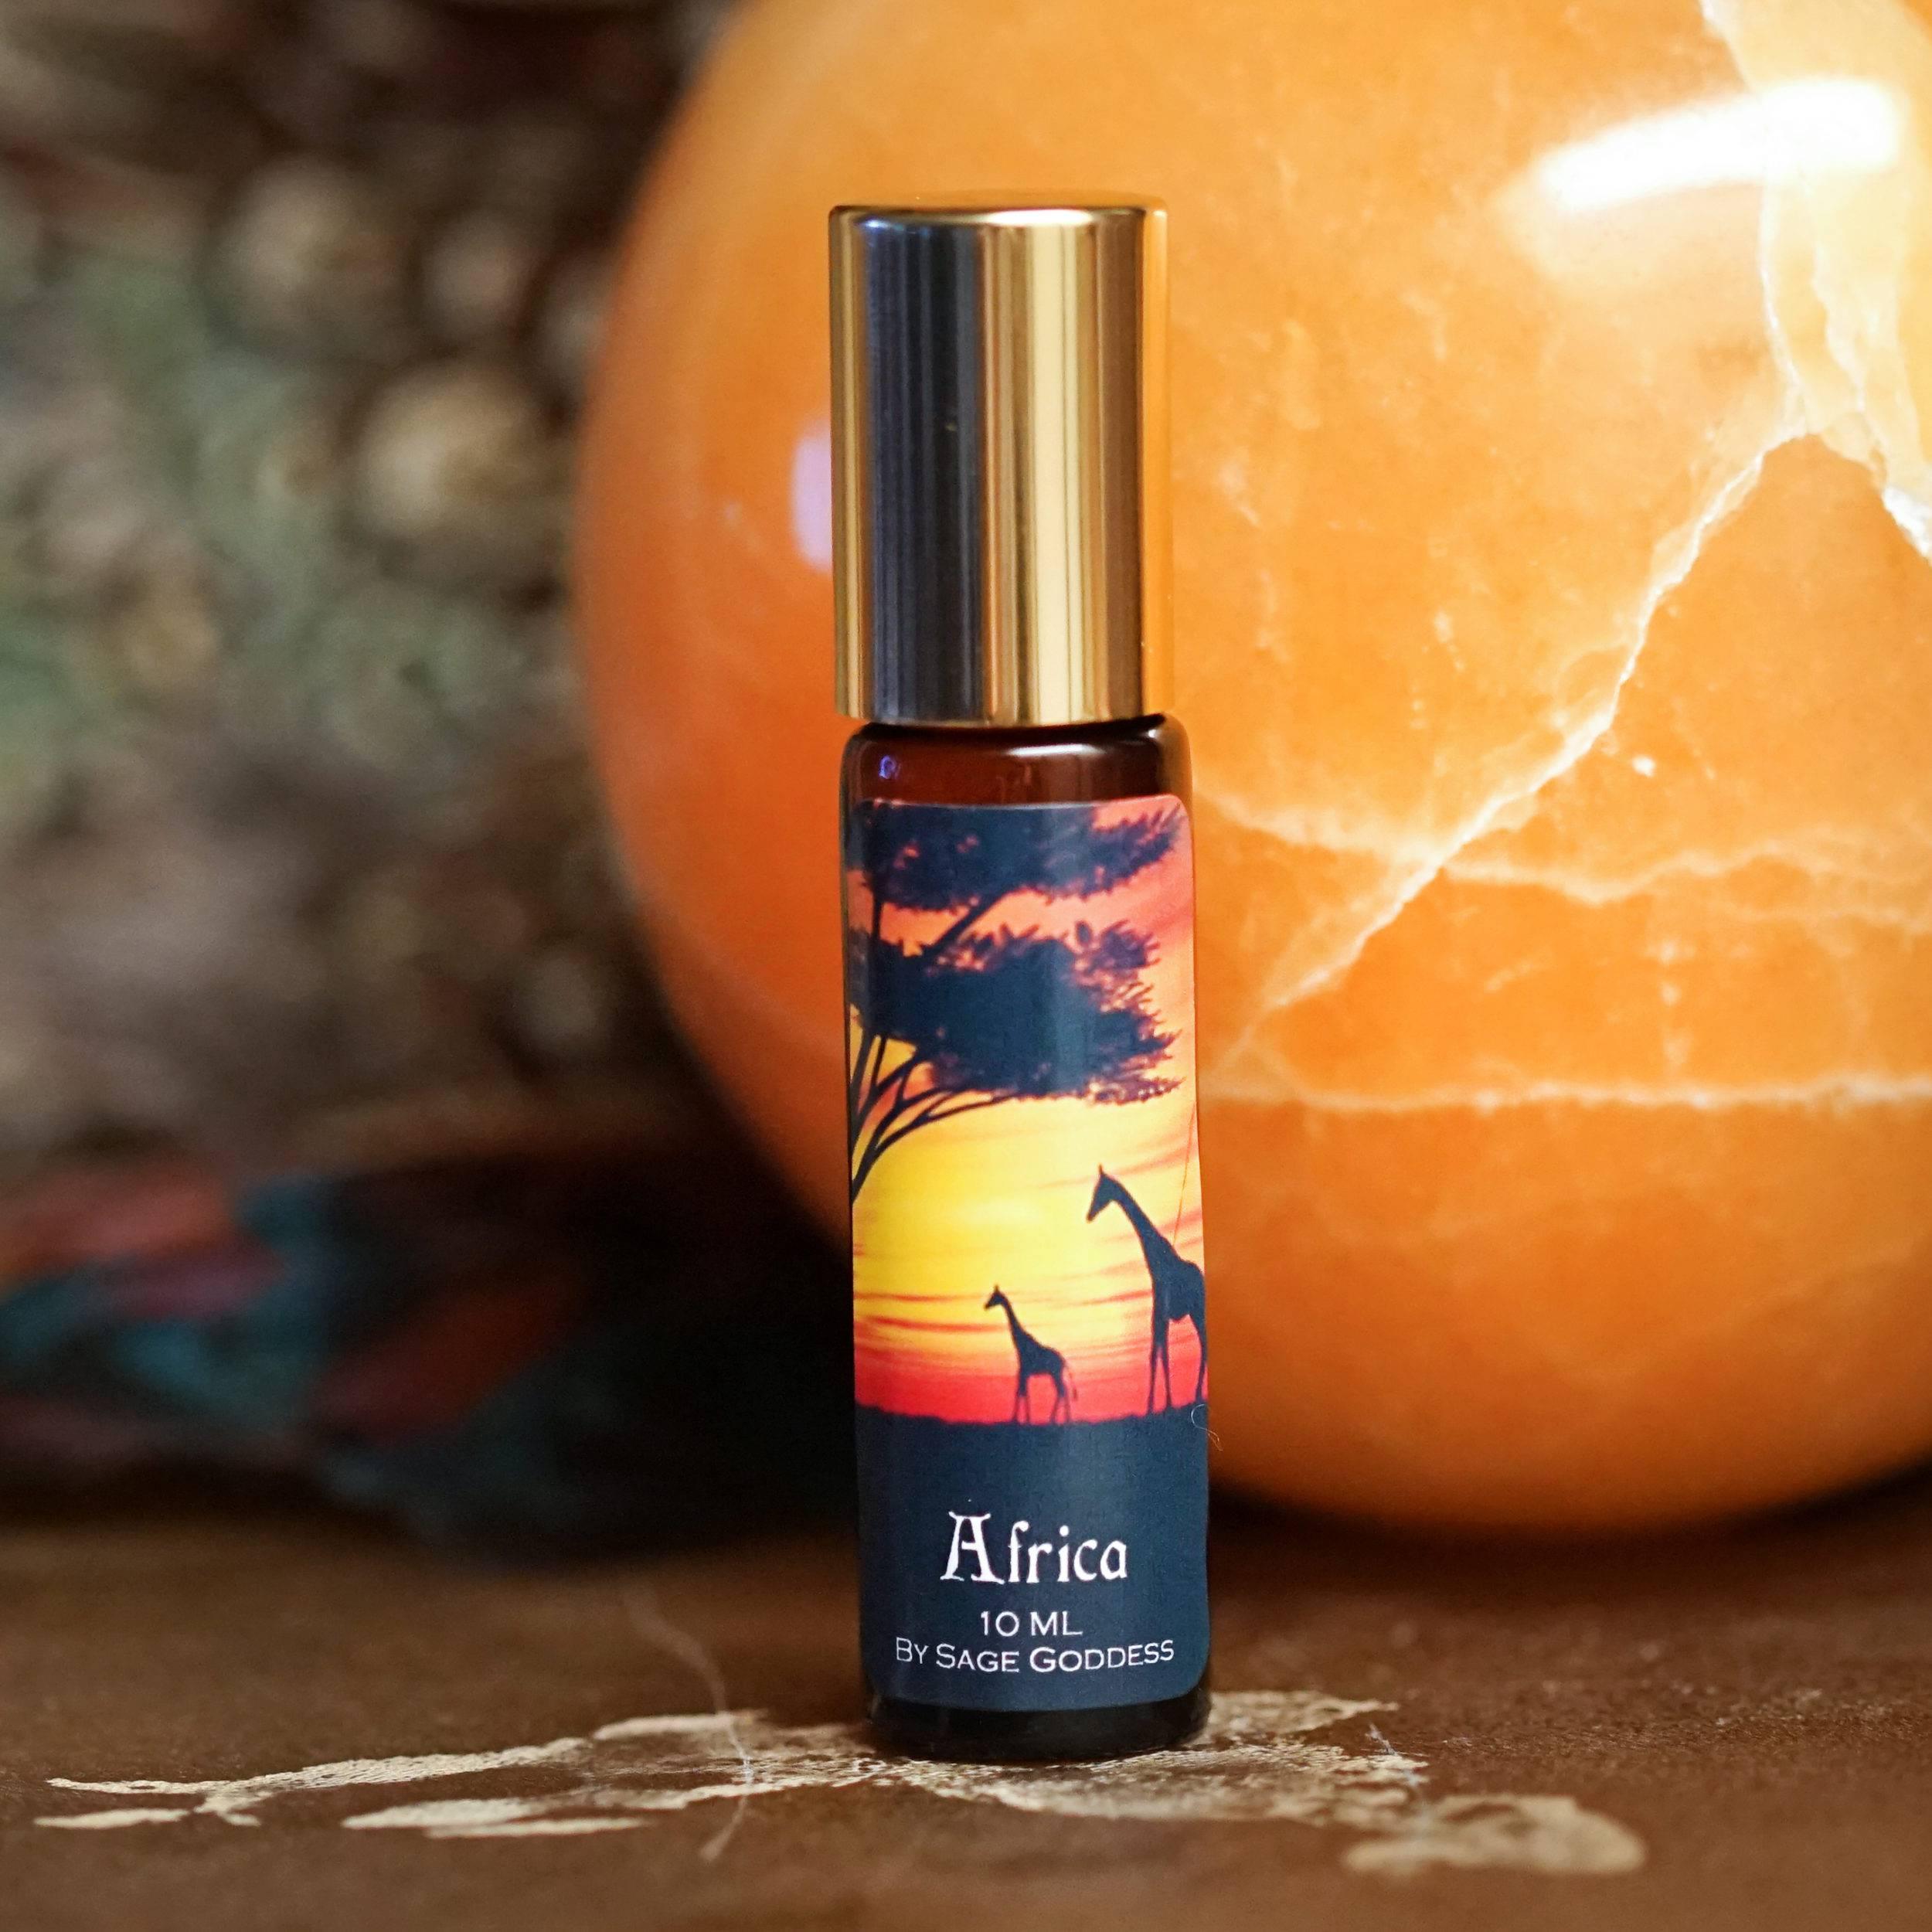 Africa Perfume